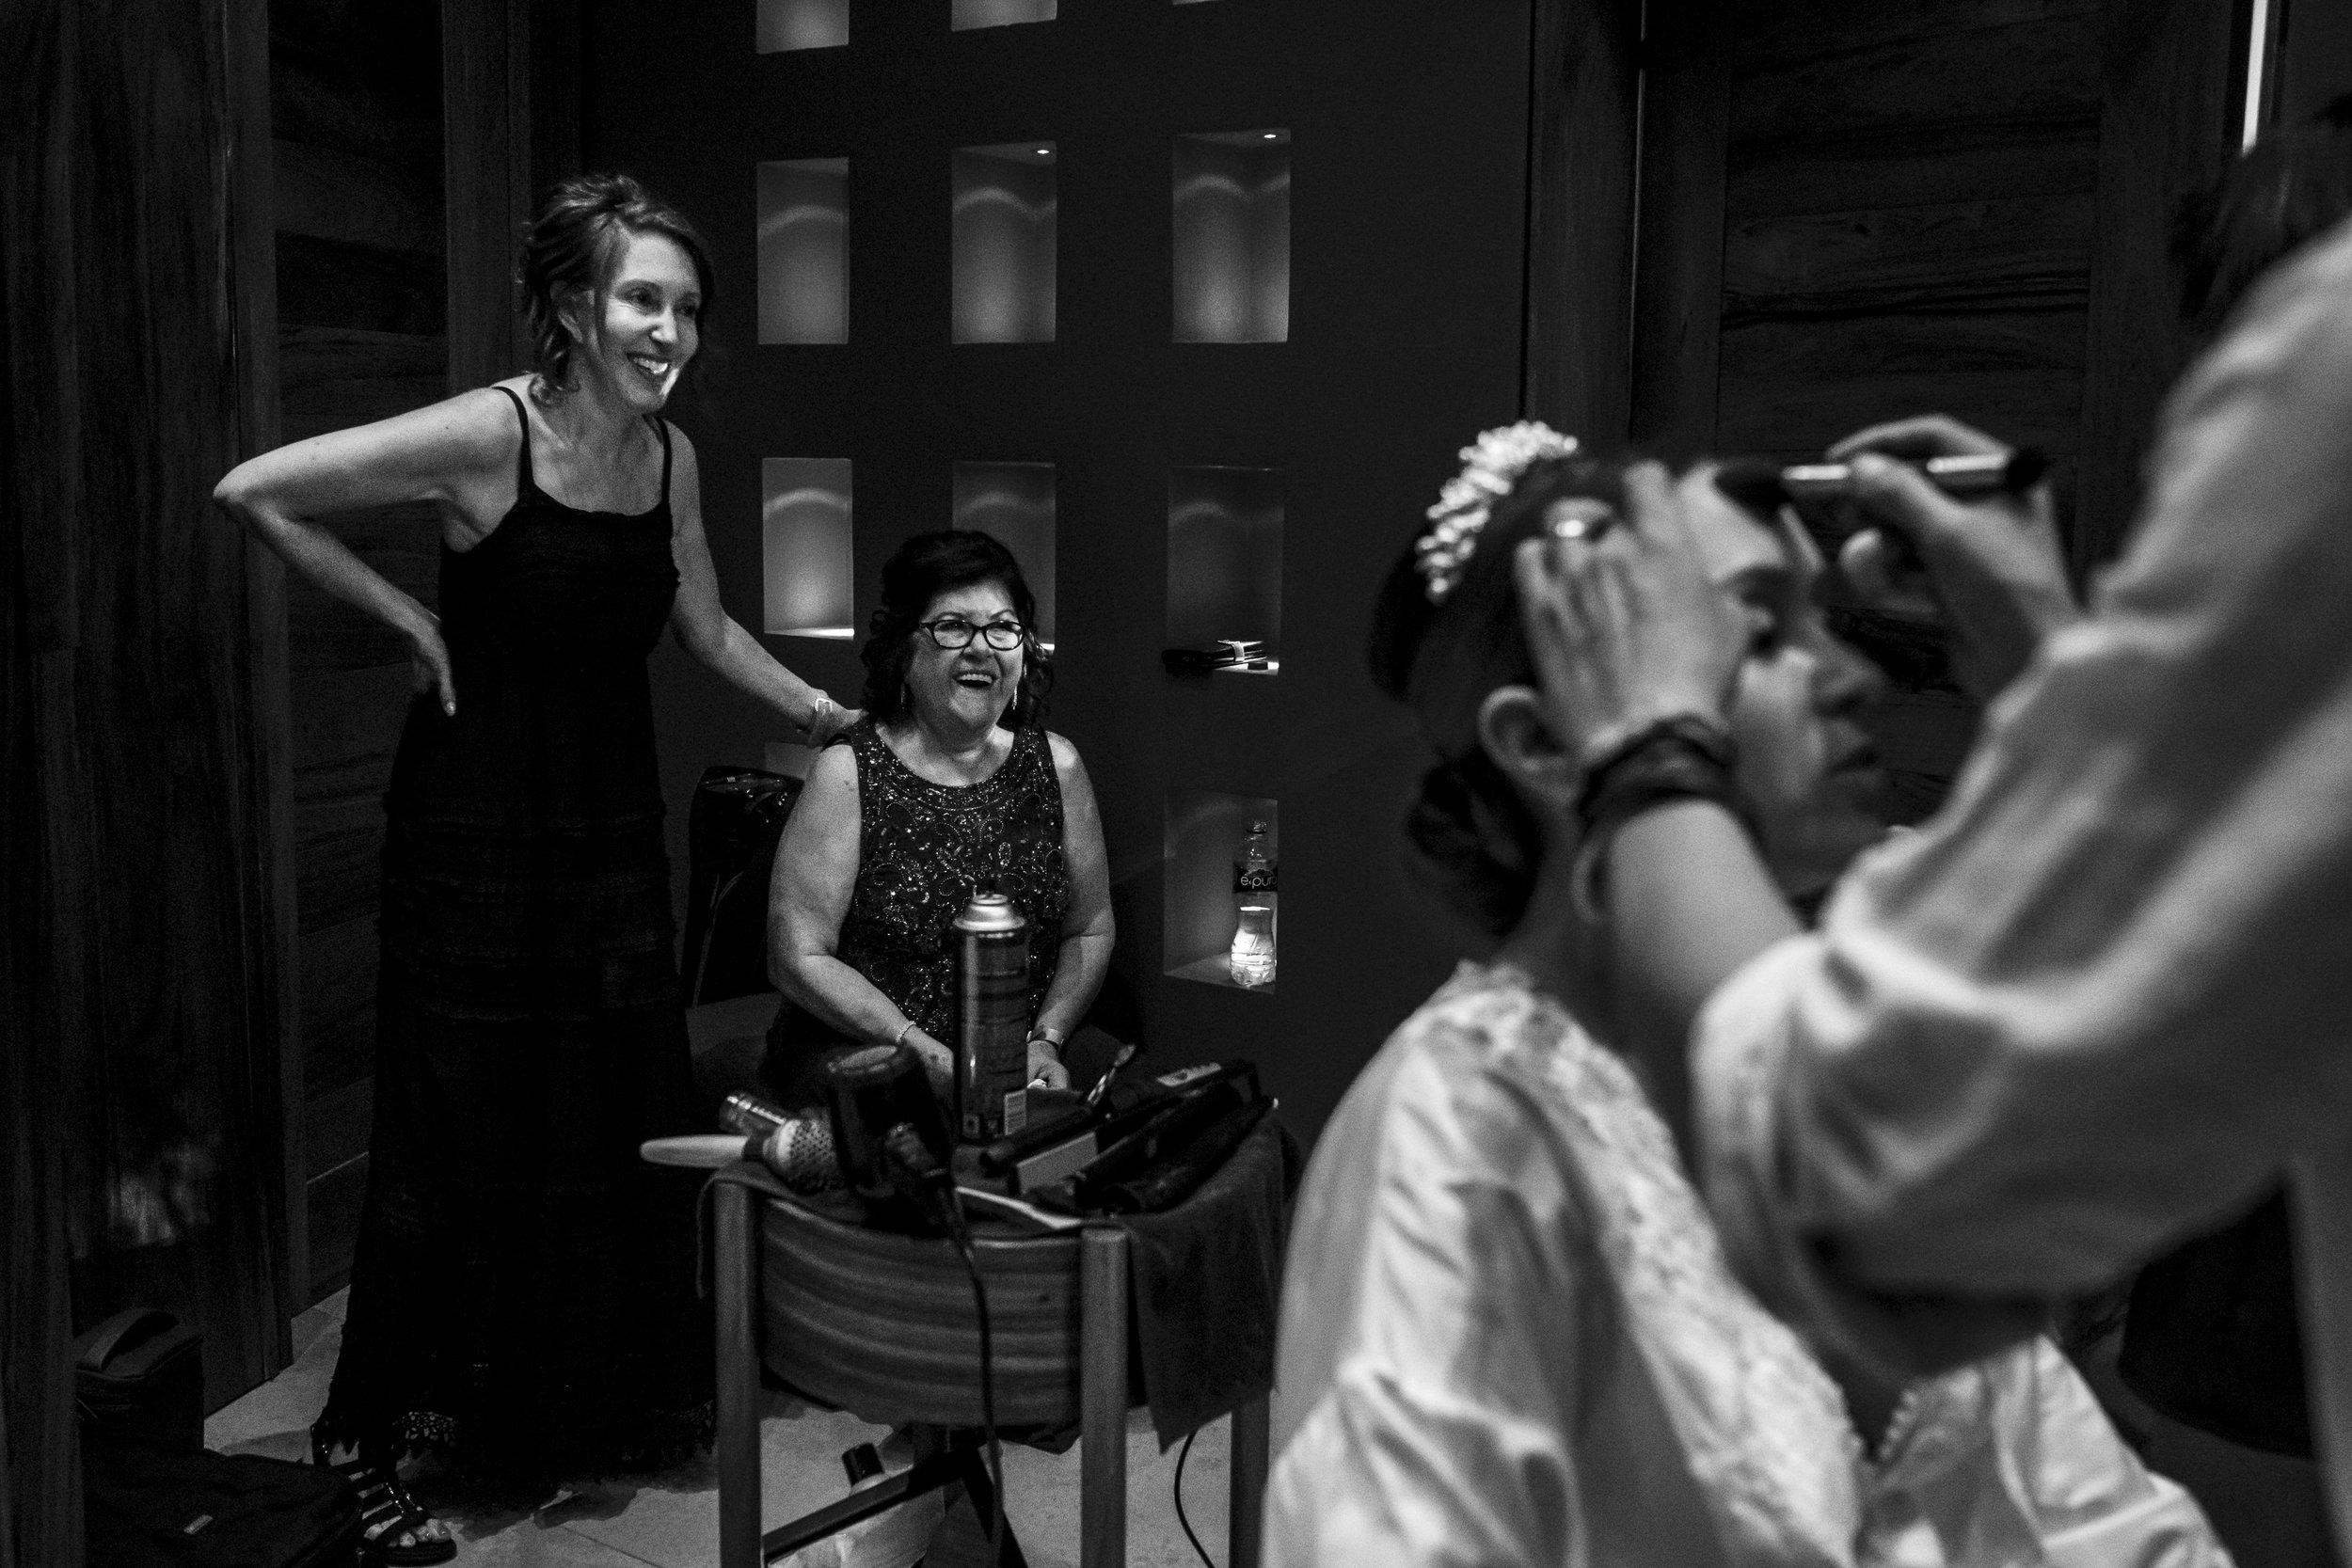 cancun_wedding_photographer_mexico (3).jpg